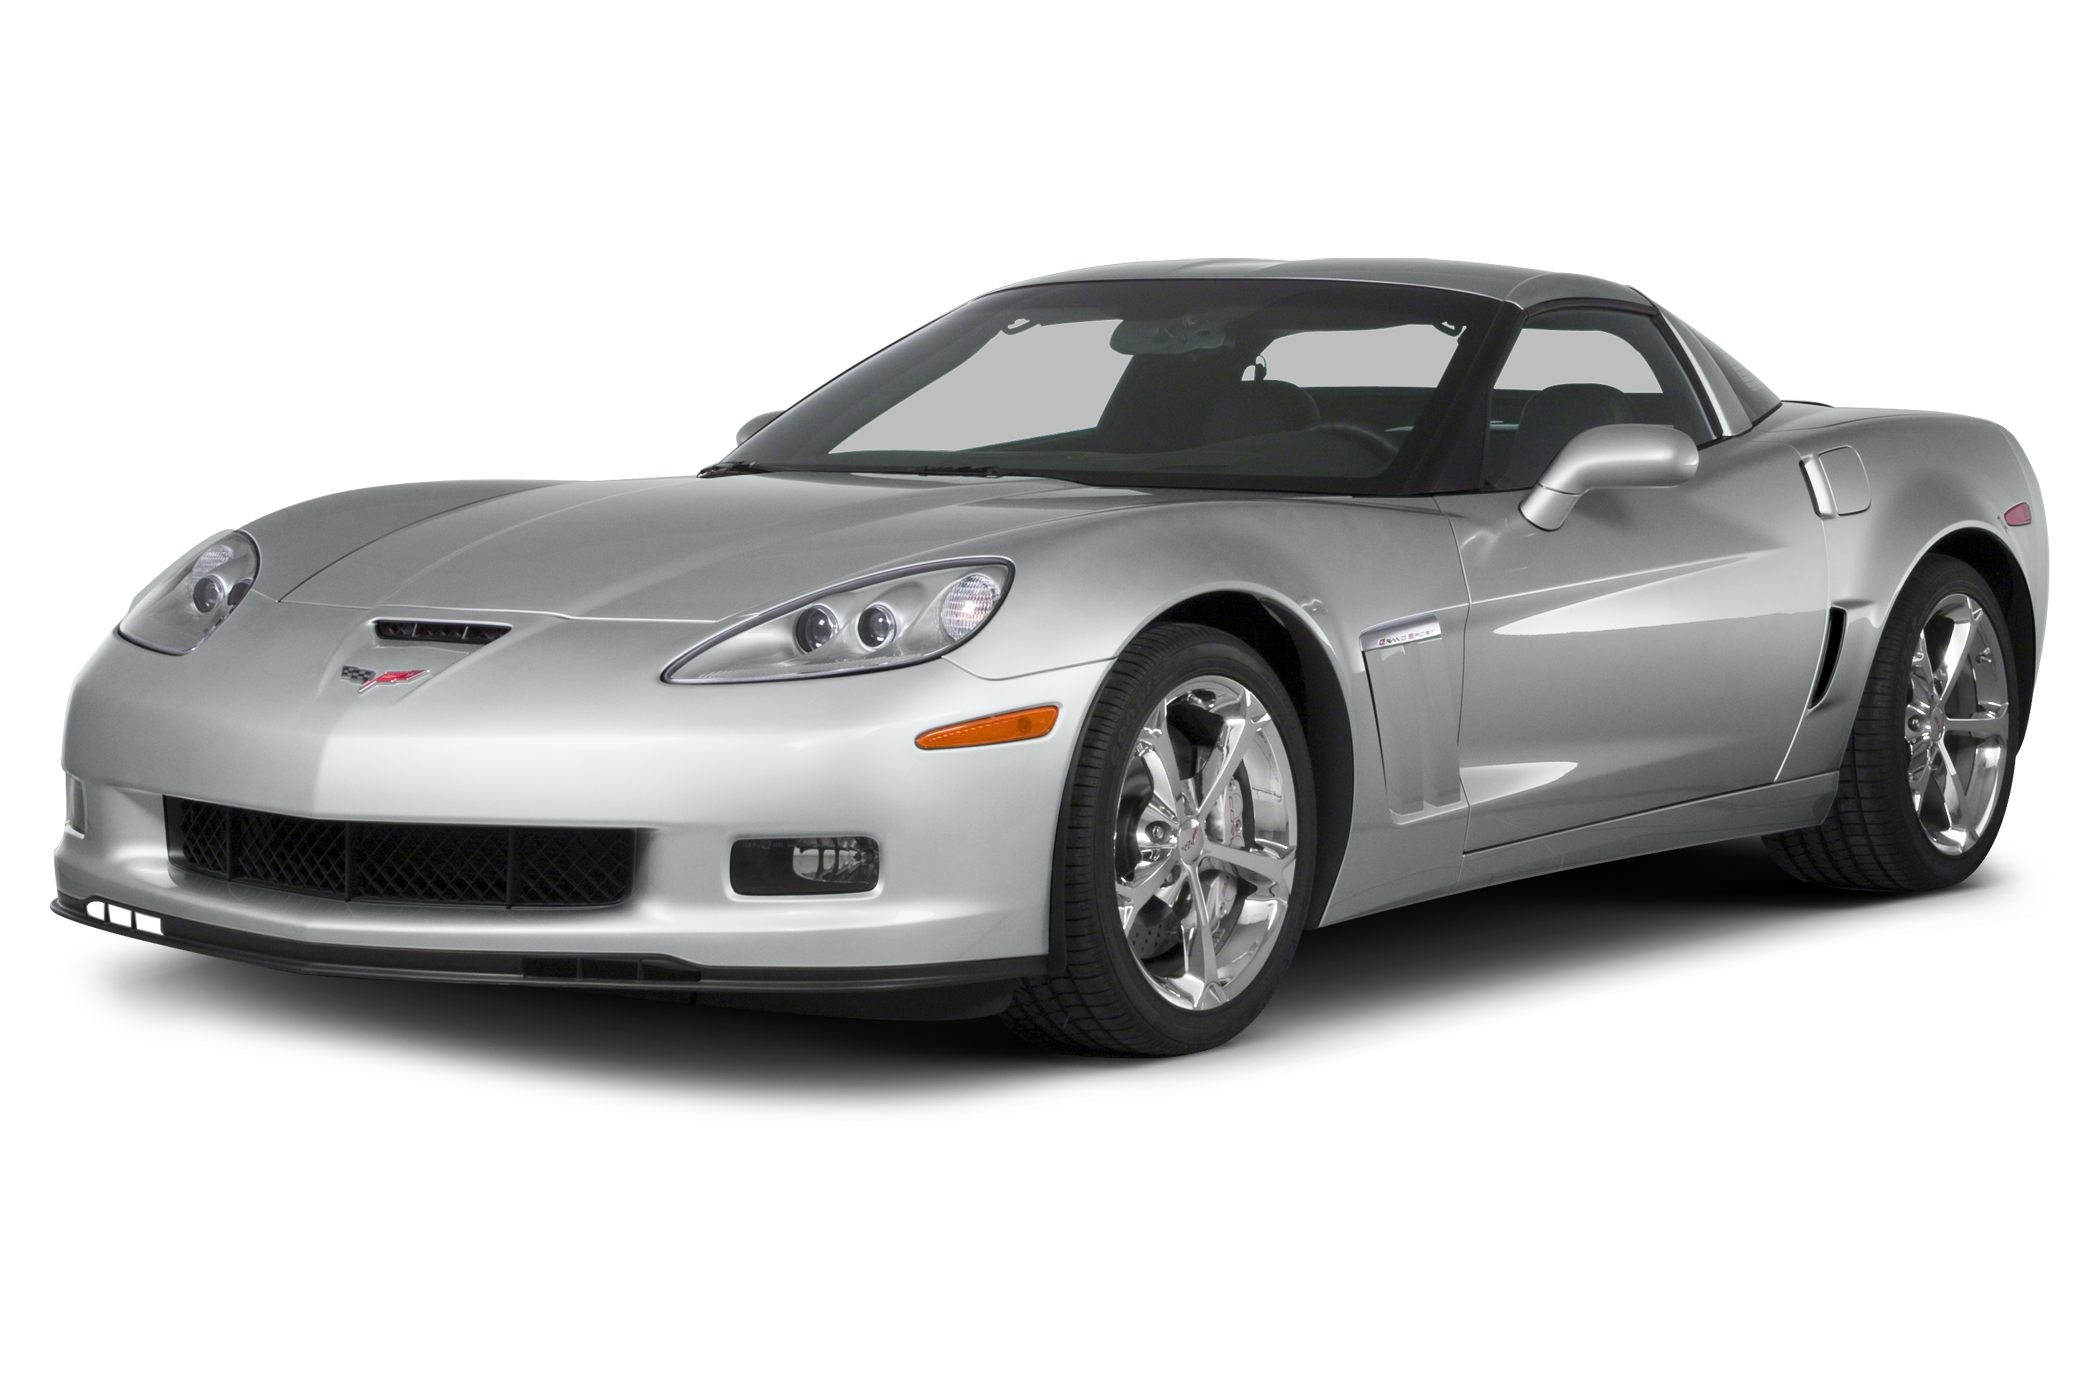 2013 Chevrolet Corvette Grand Sport 2dr Coupe